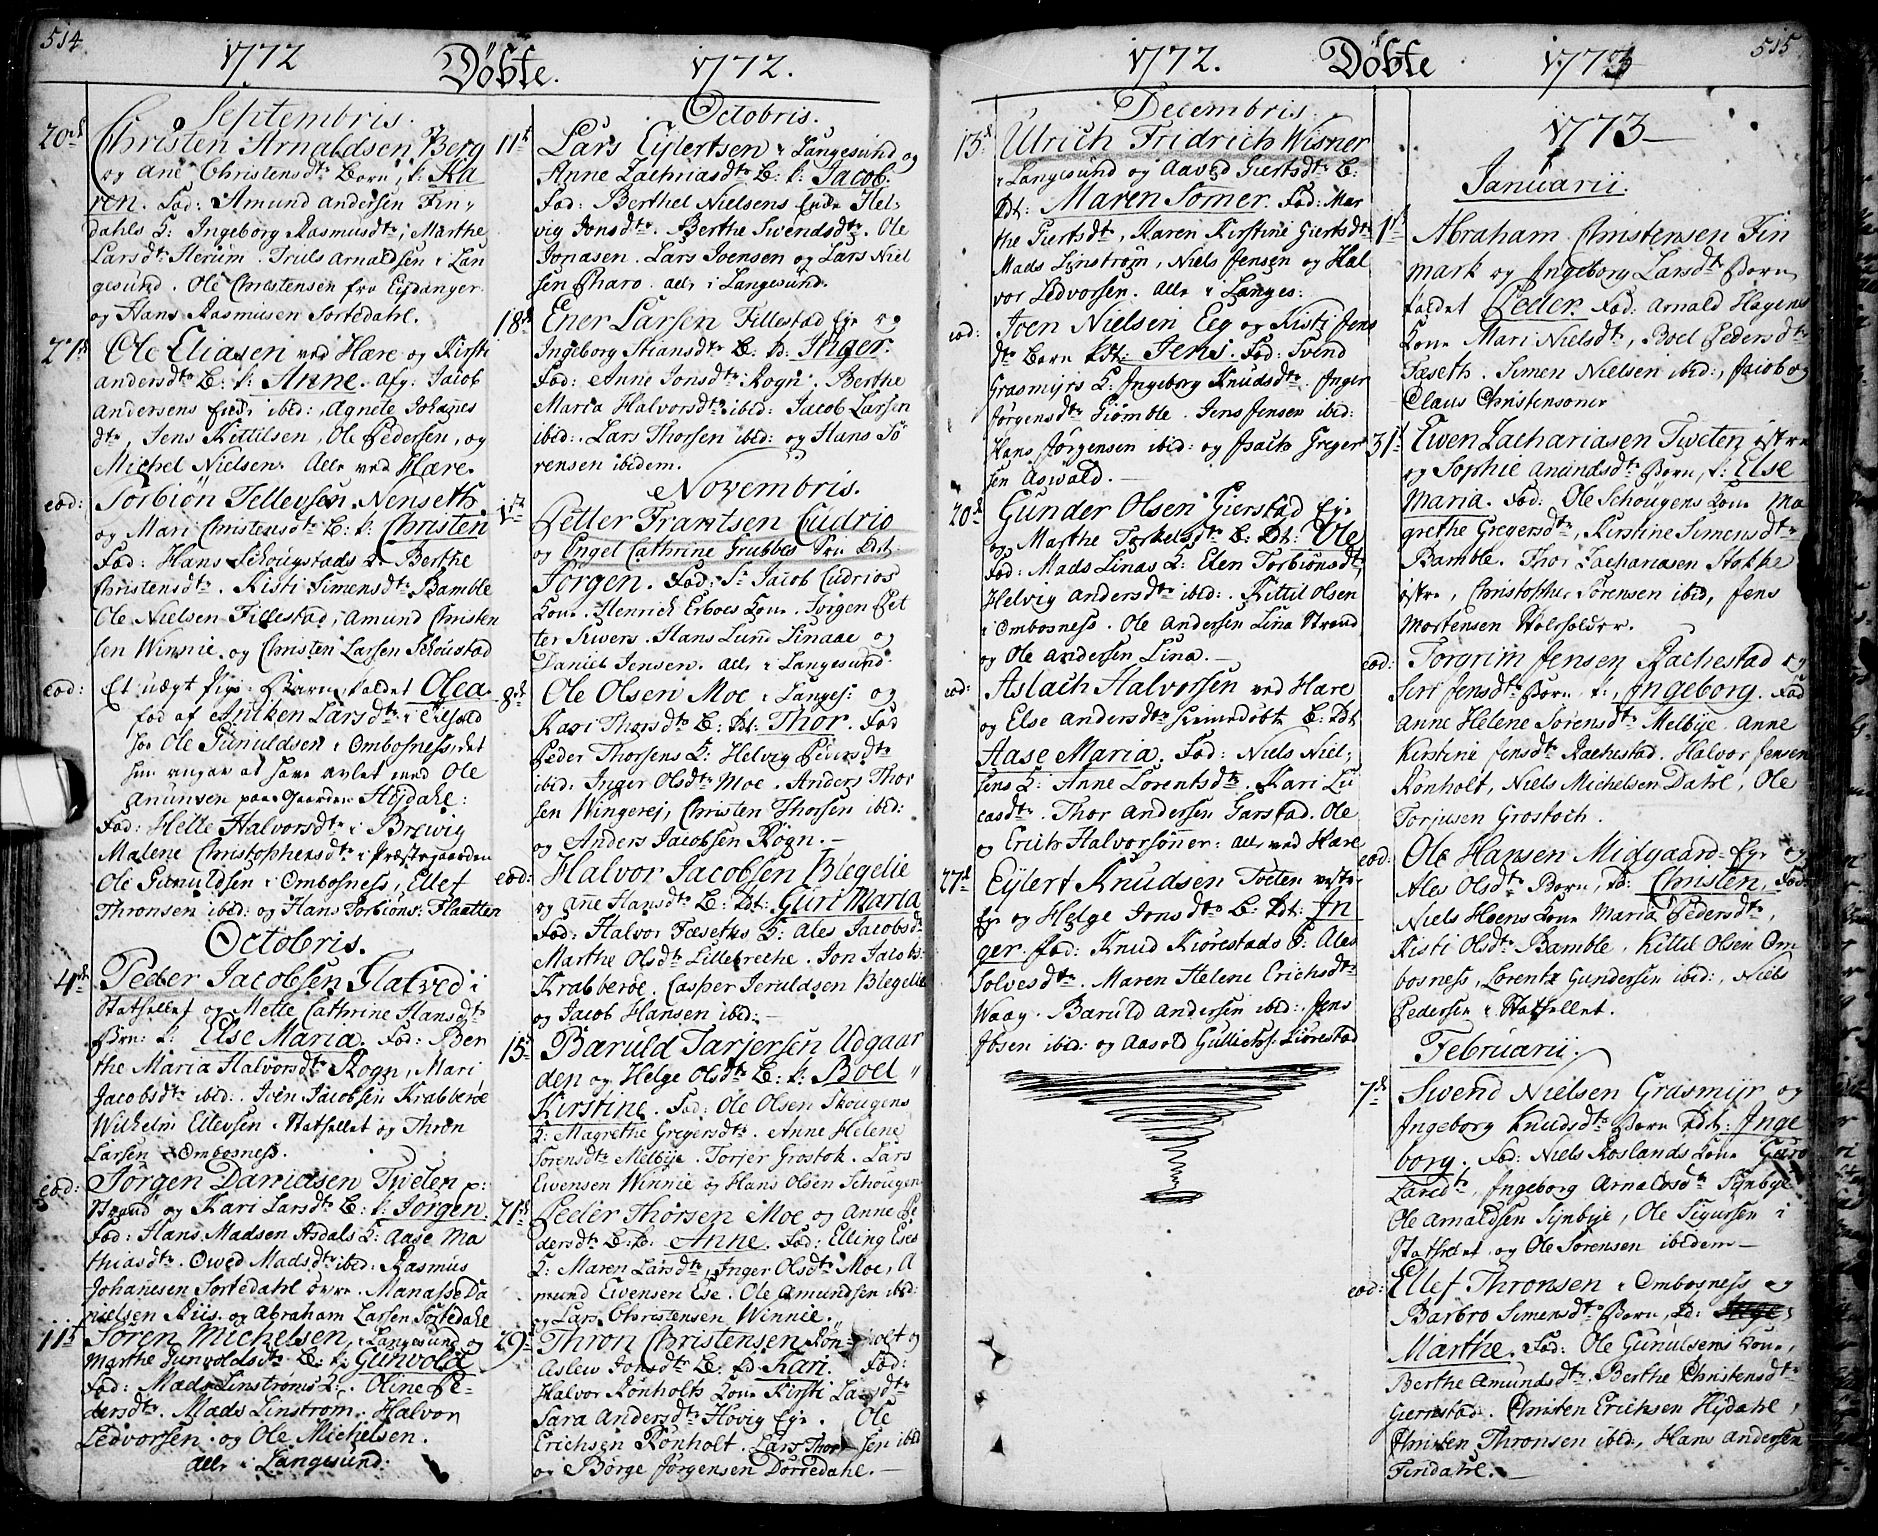 SAKO, Bamble kirkebøker, F/Fa/L0001: Ministerialbok nr. I 1, 1702-1774, s. 514-515